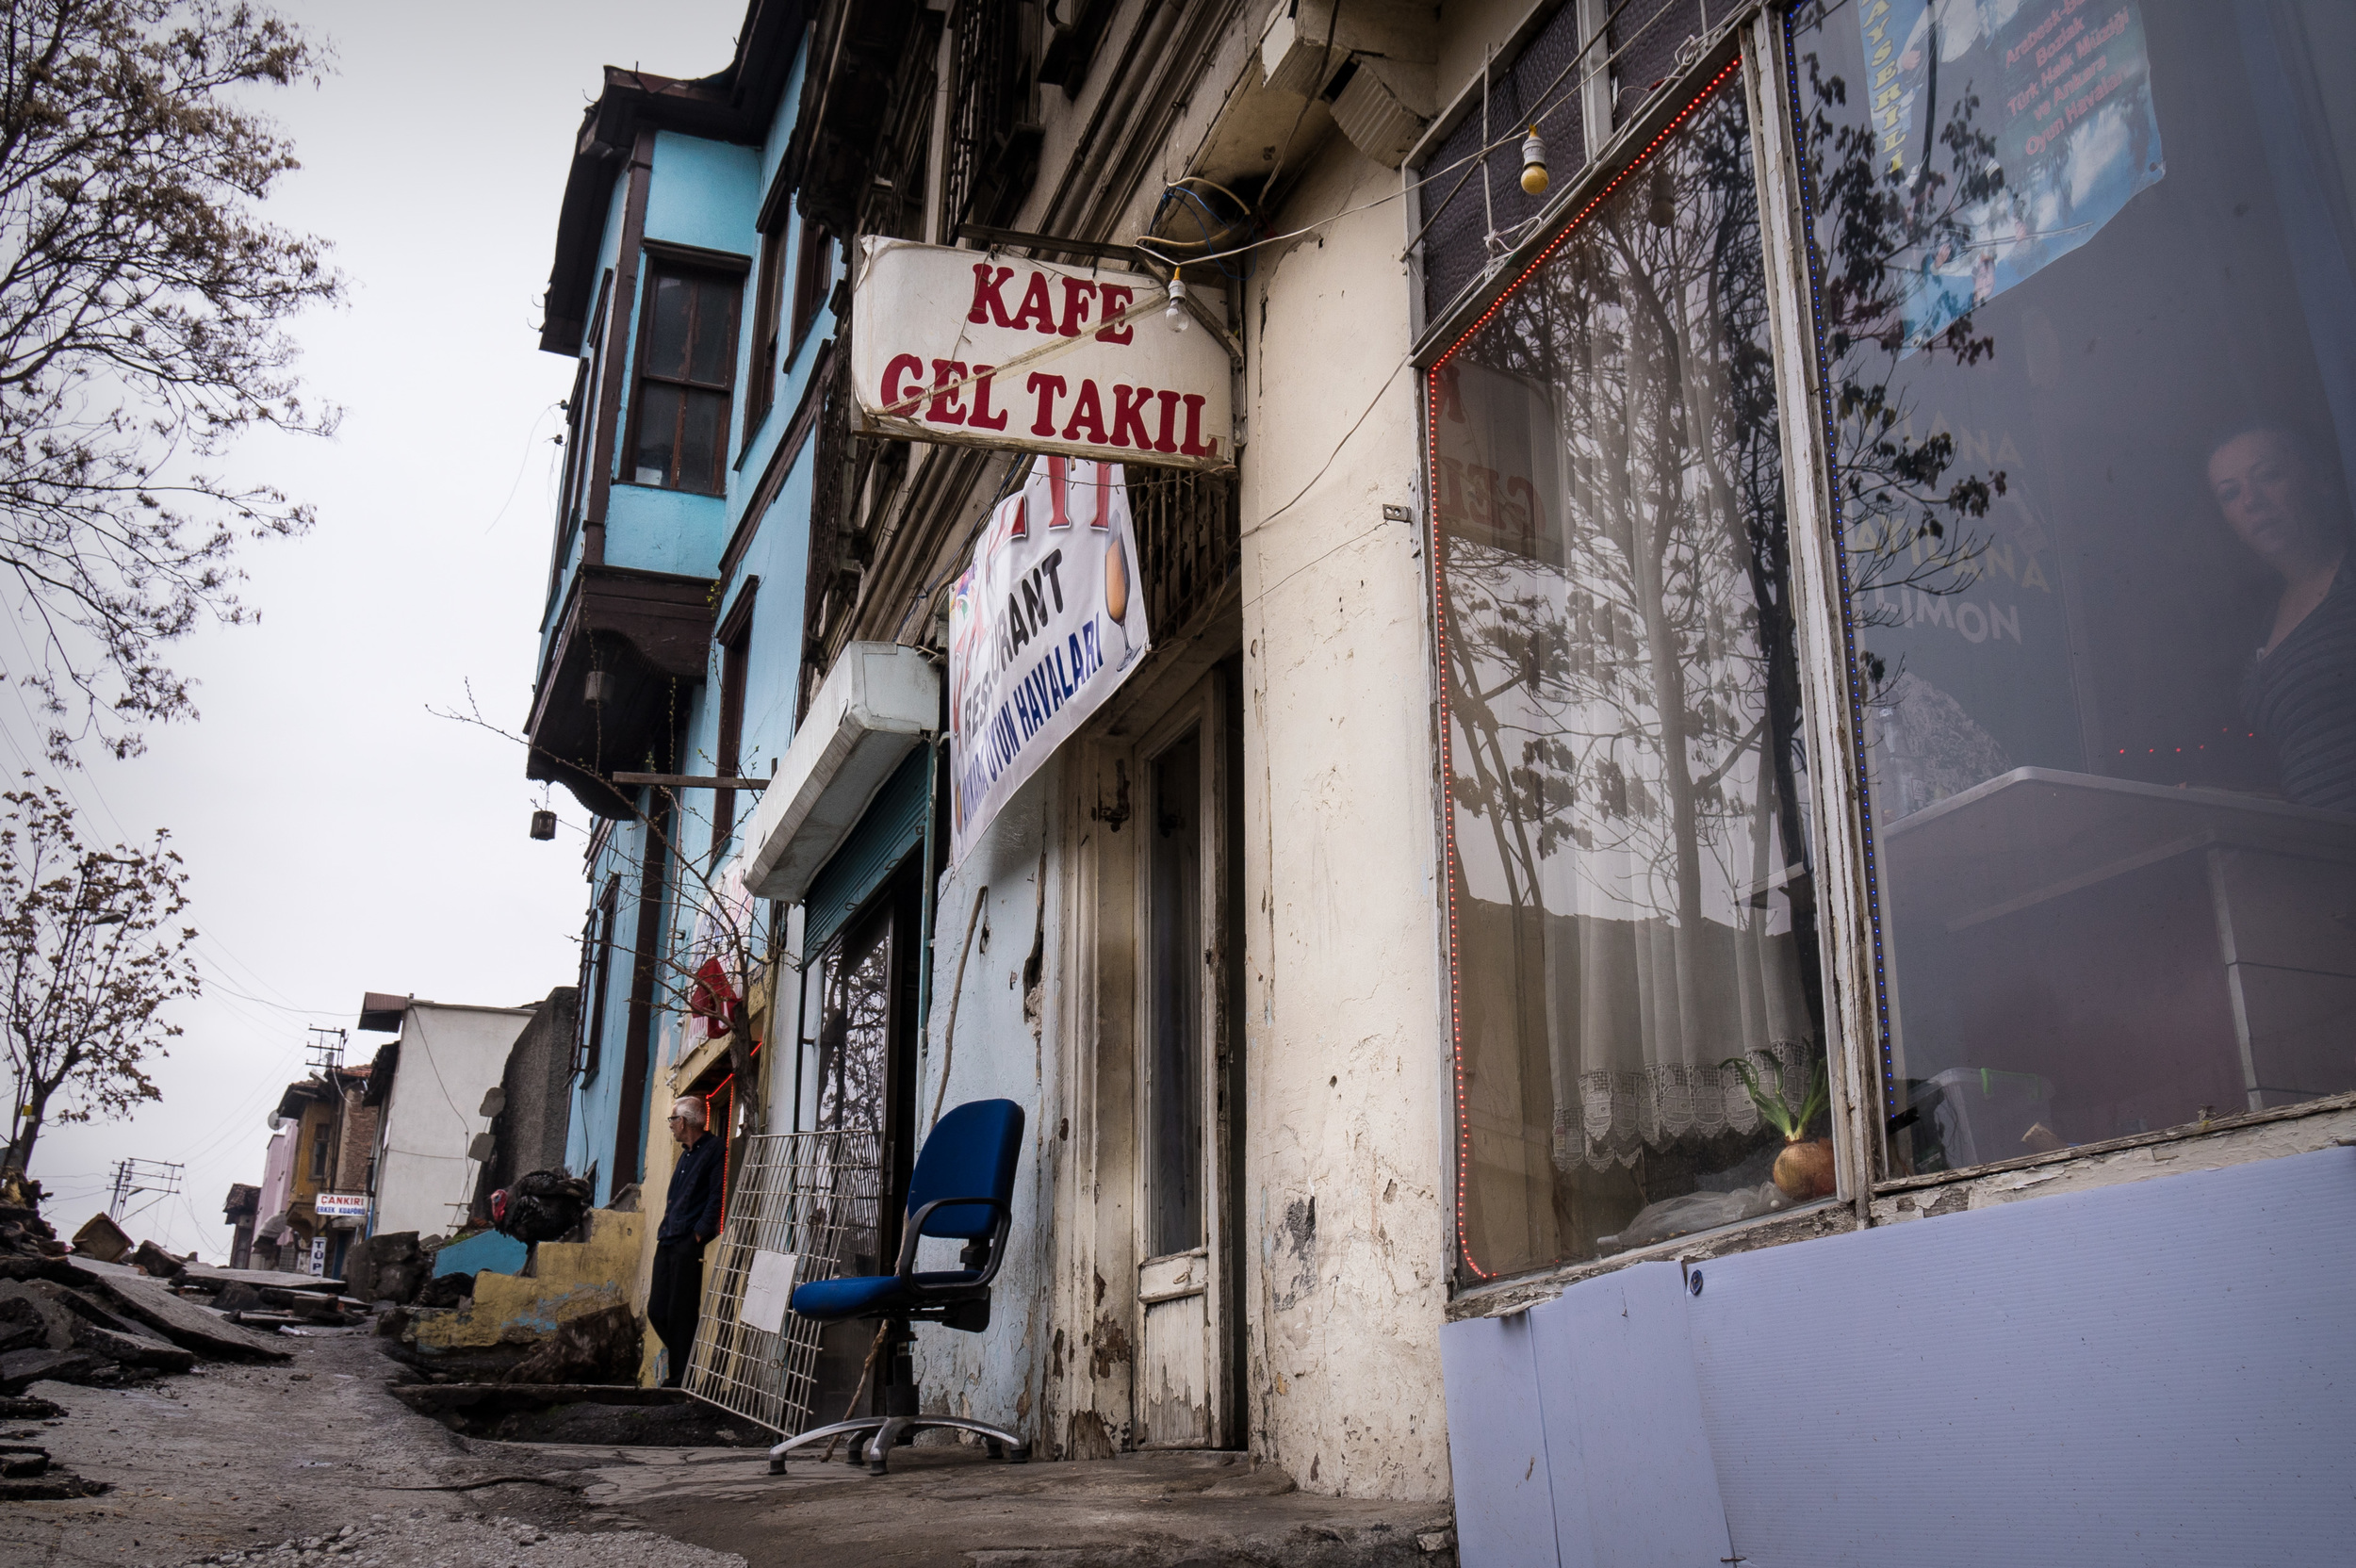 Ankara, Ulus, 2016